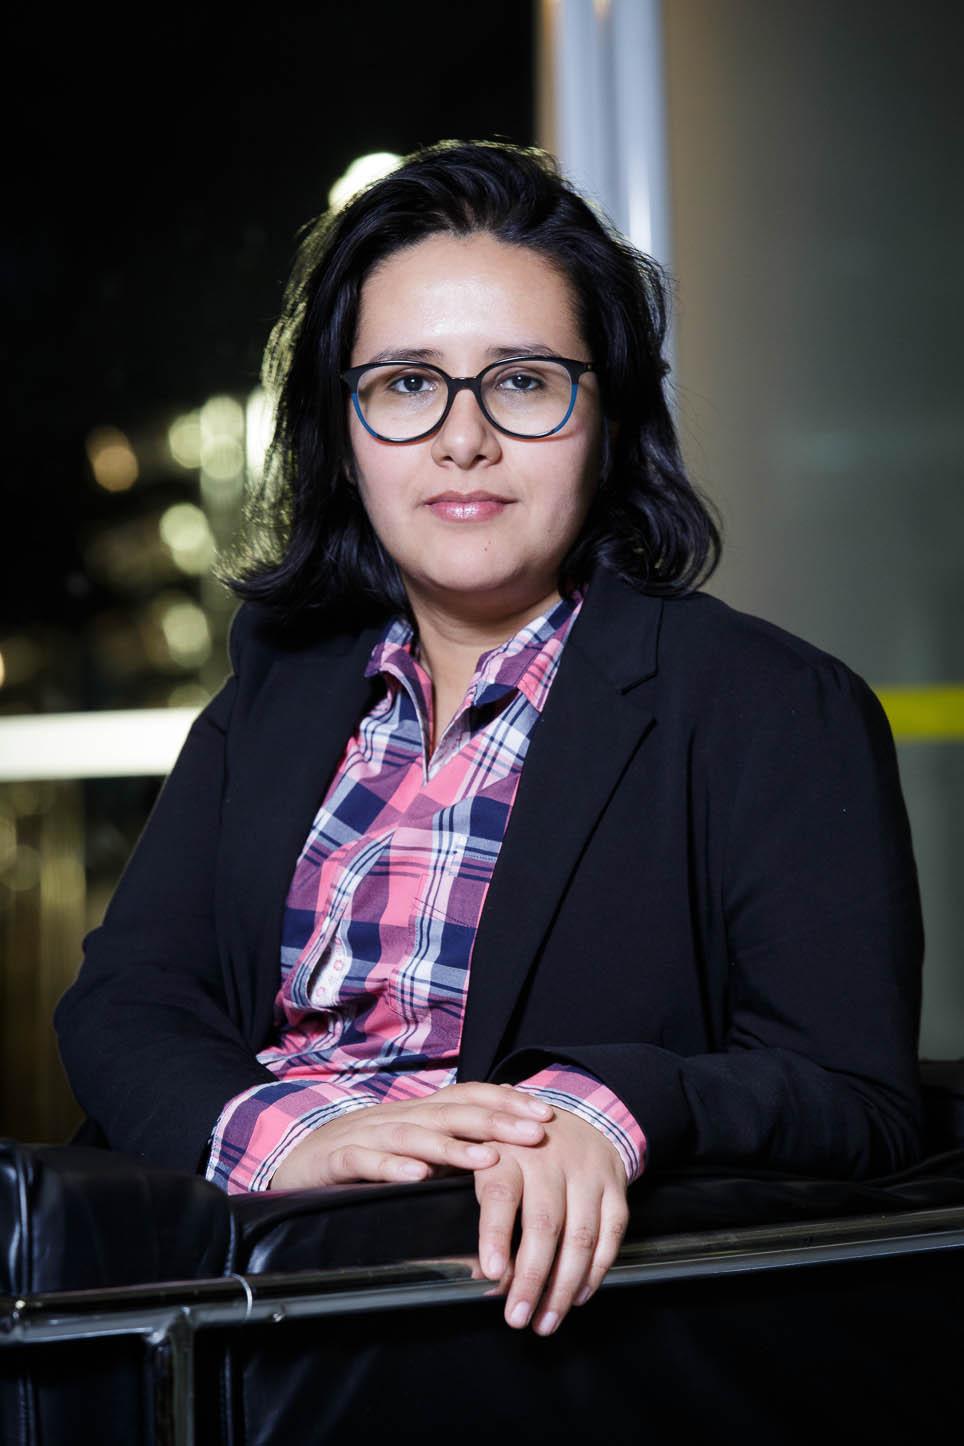 Juliana Rojas